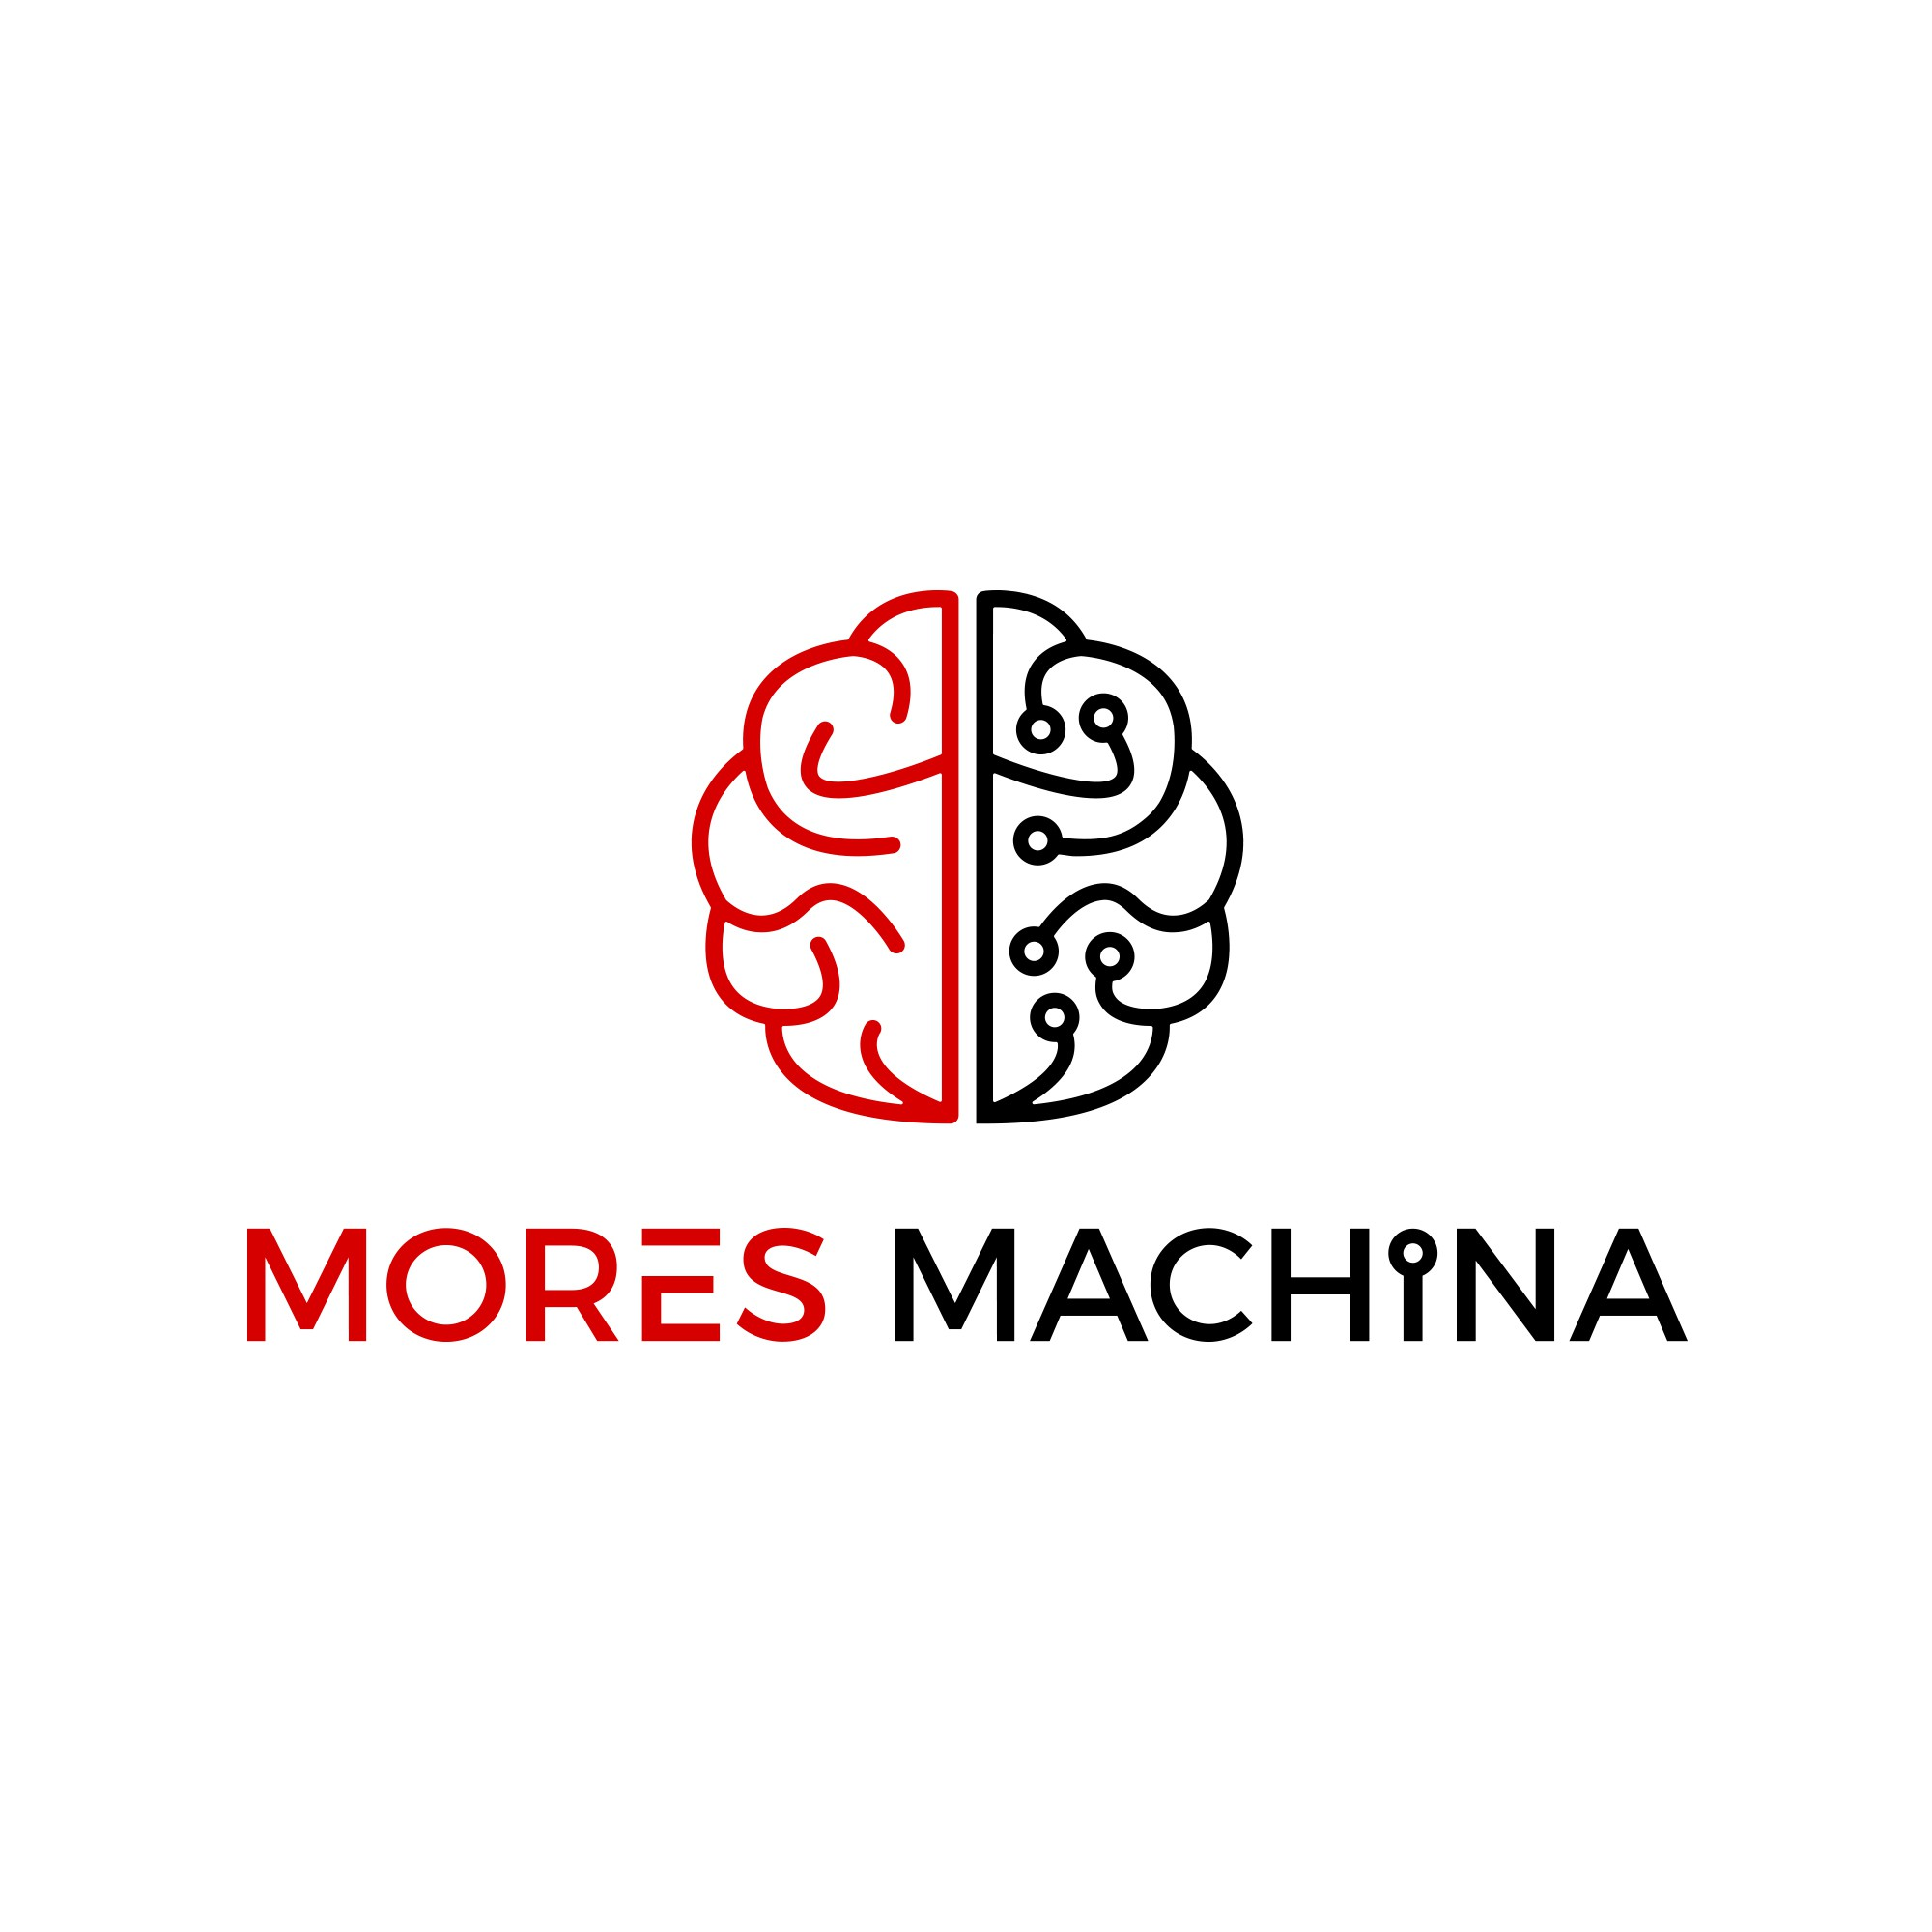 Mores Machina